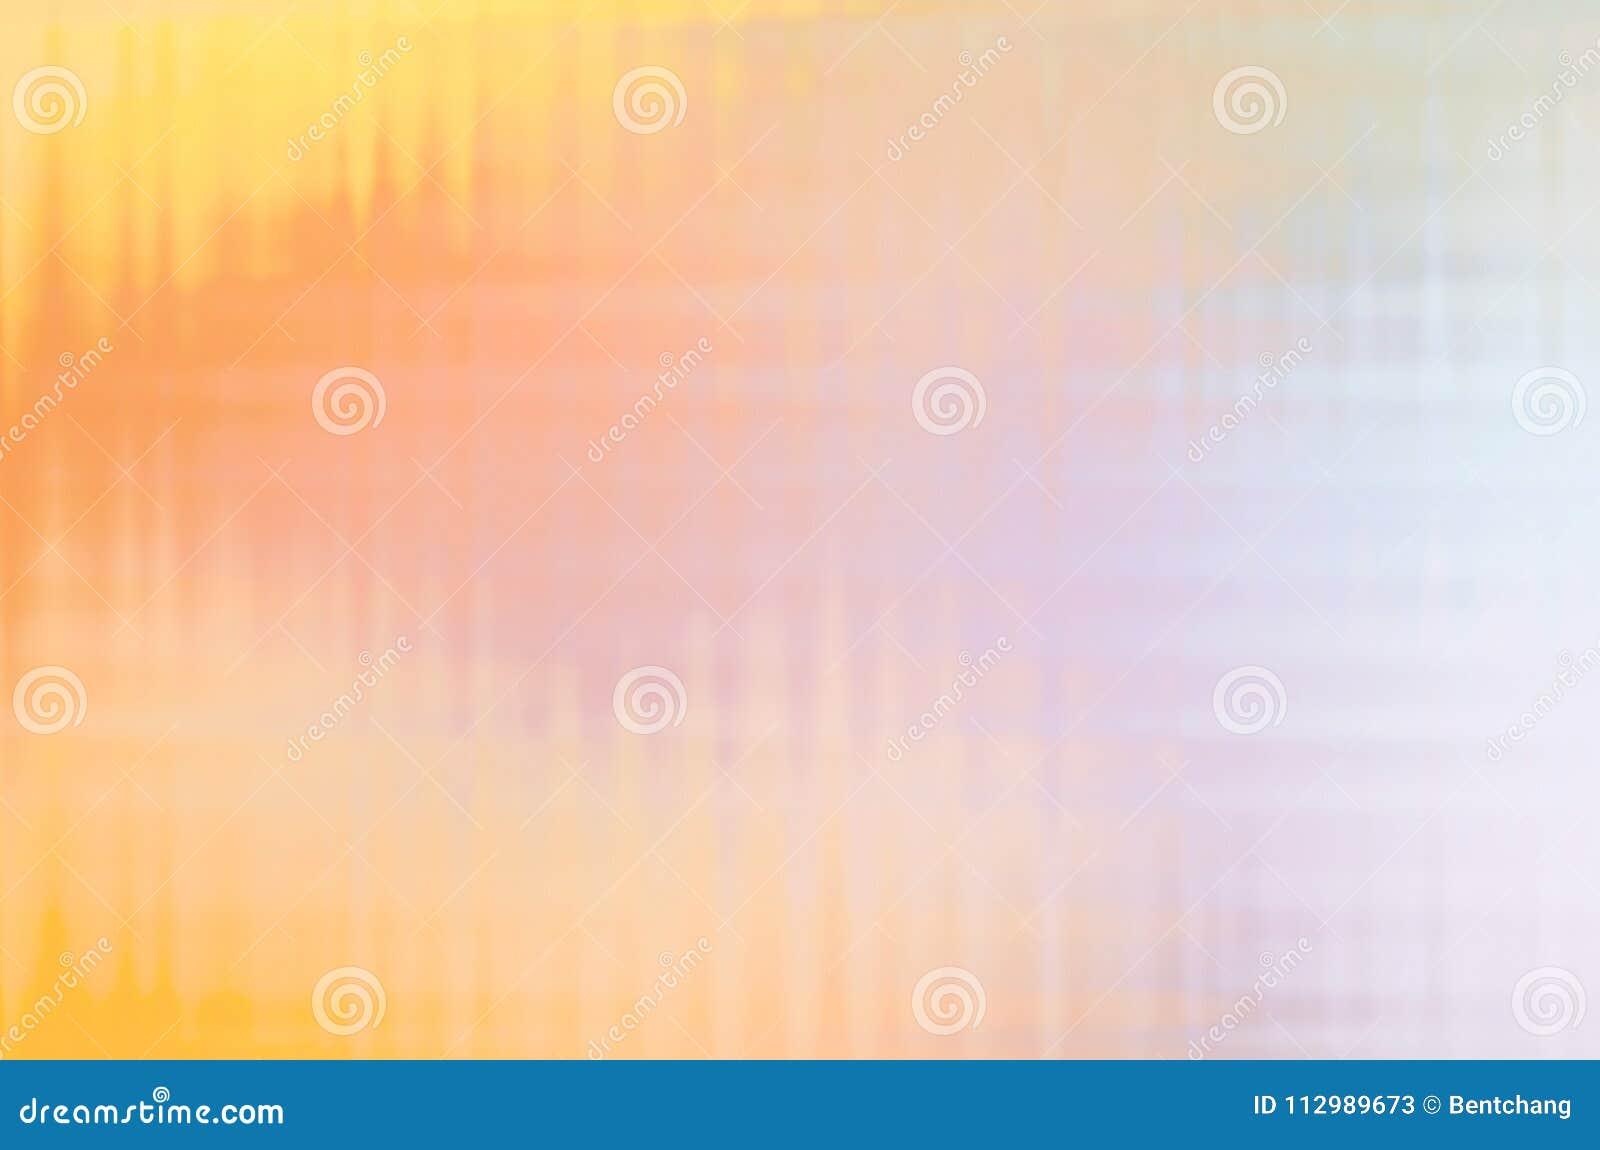 Motion background blur, good for graphic design. Light, blue, bubble & movement.